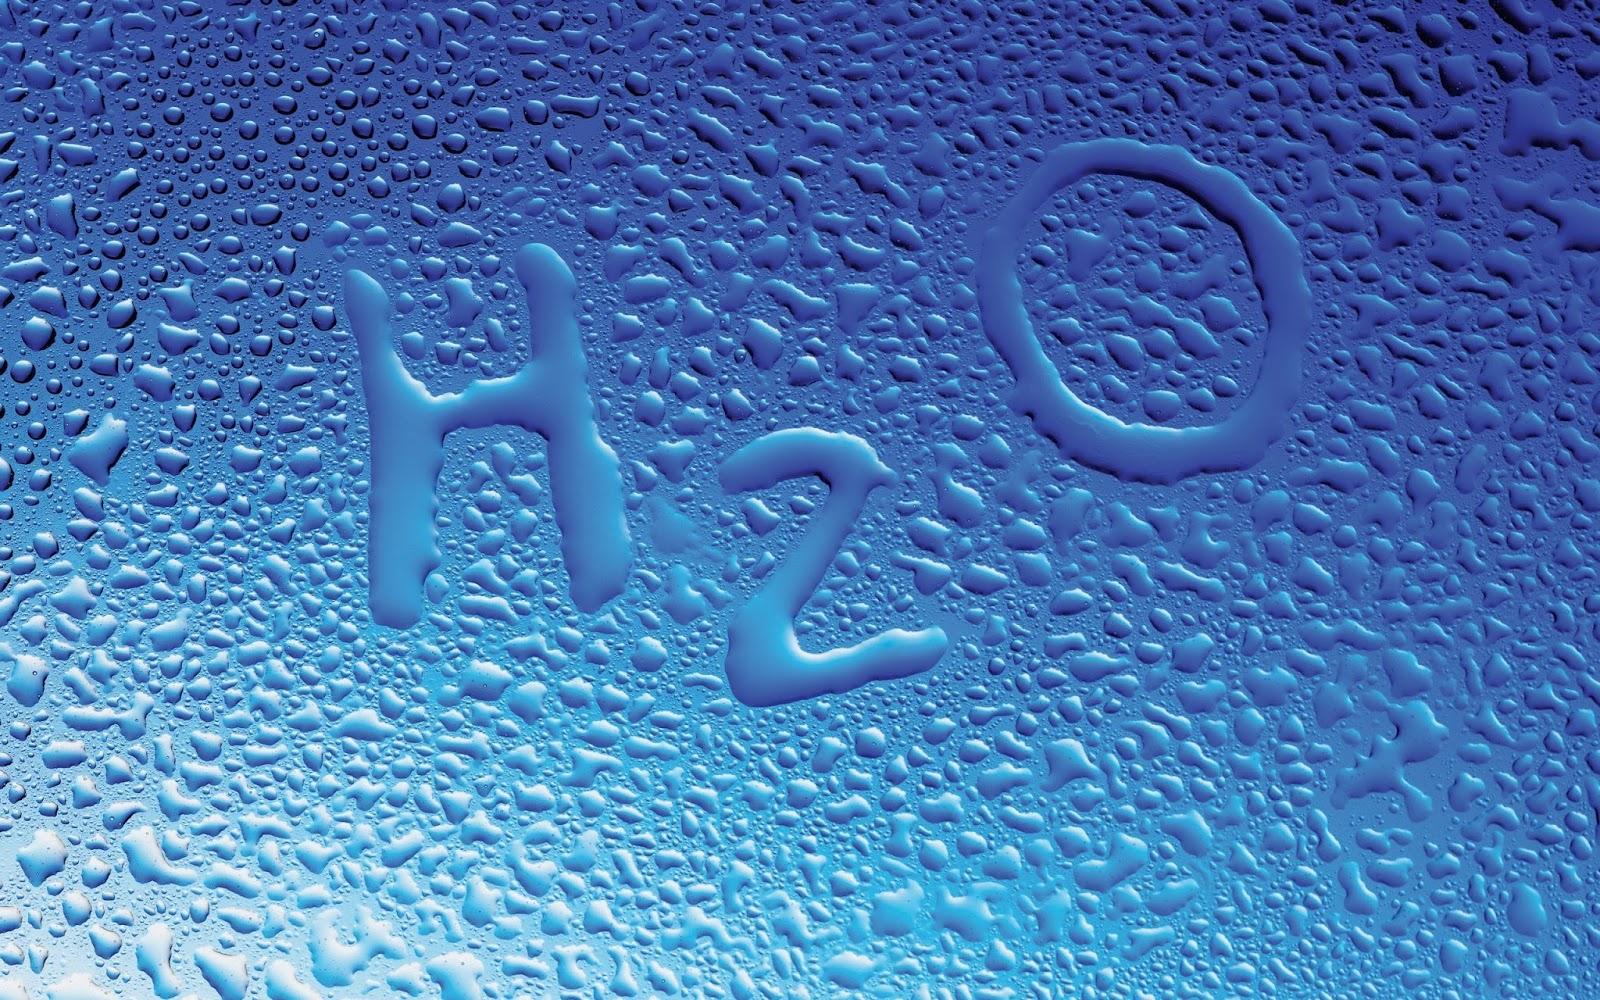 Fungsi Manfaat Air Bagi Tubuh Makhluk Hidup